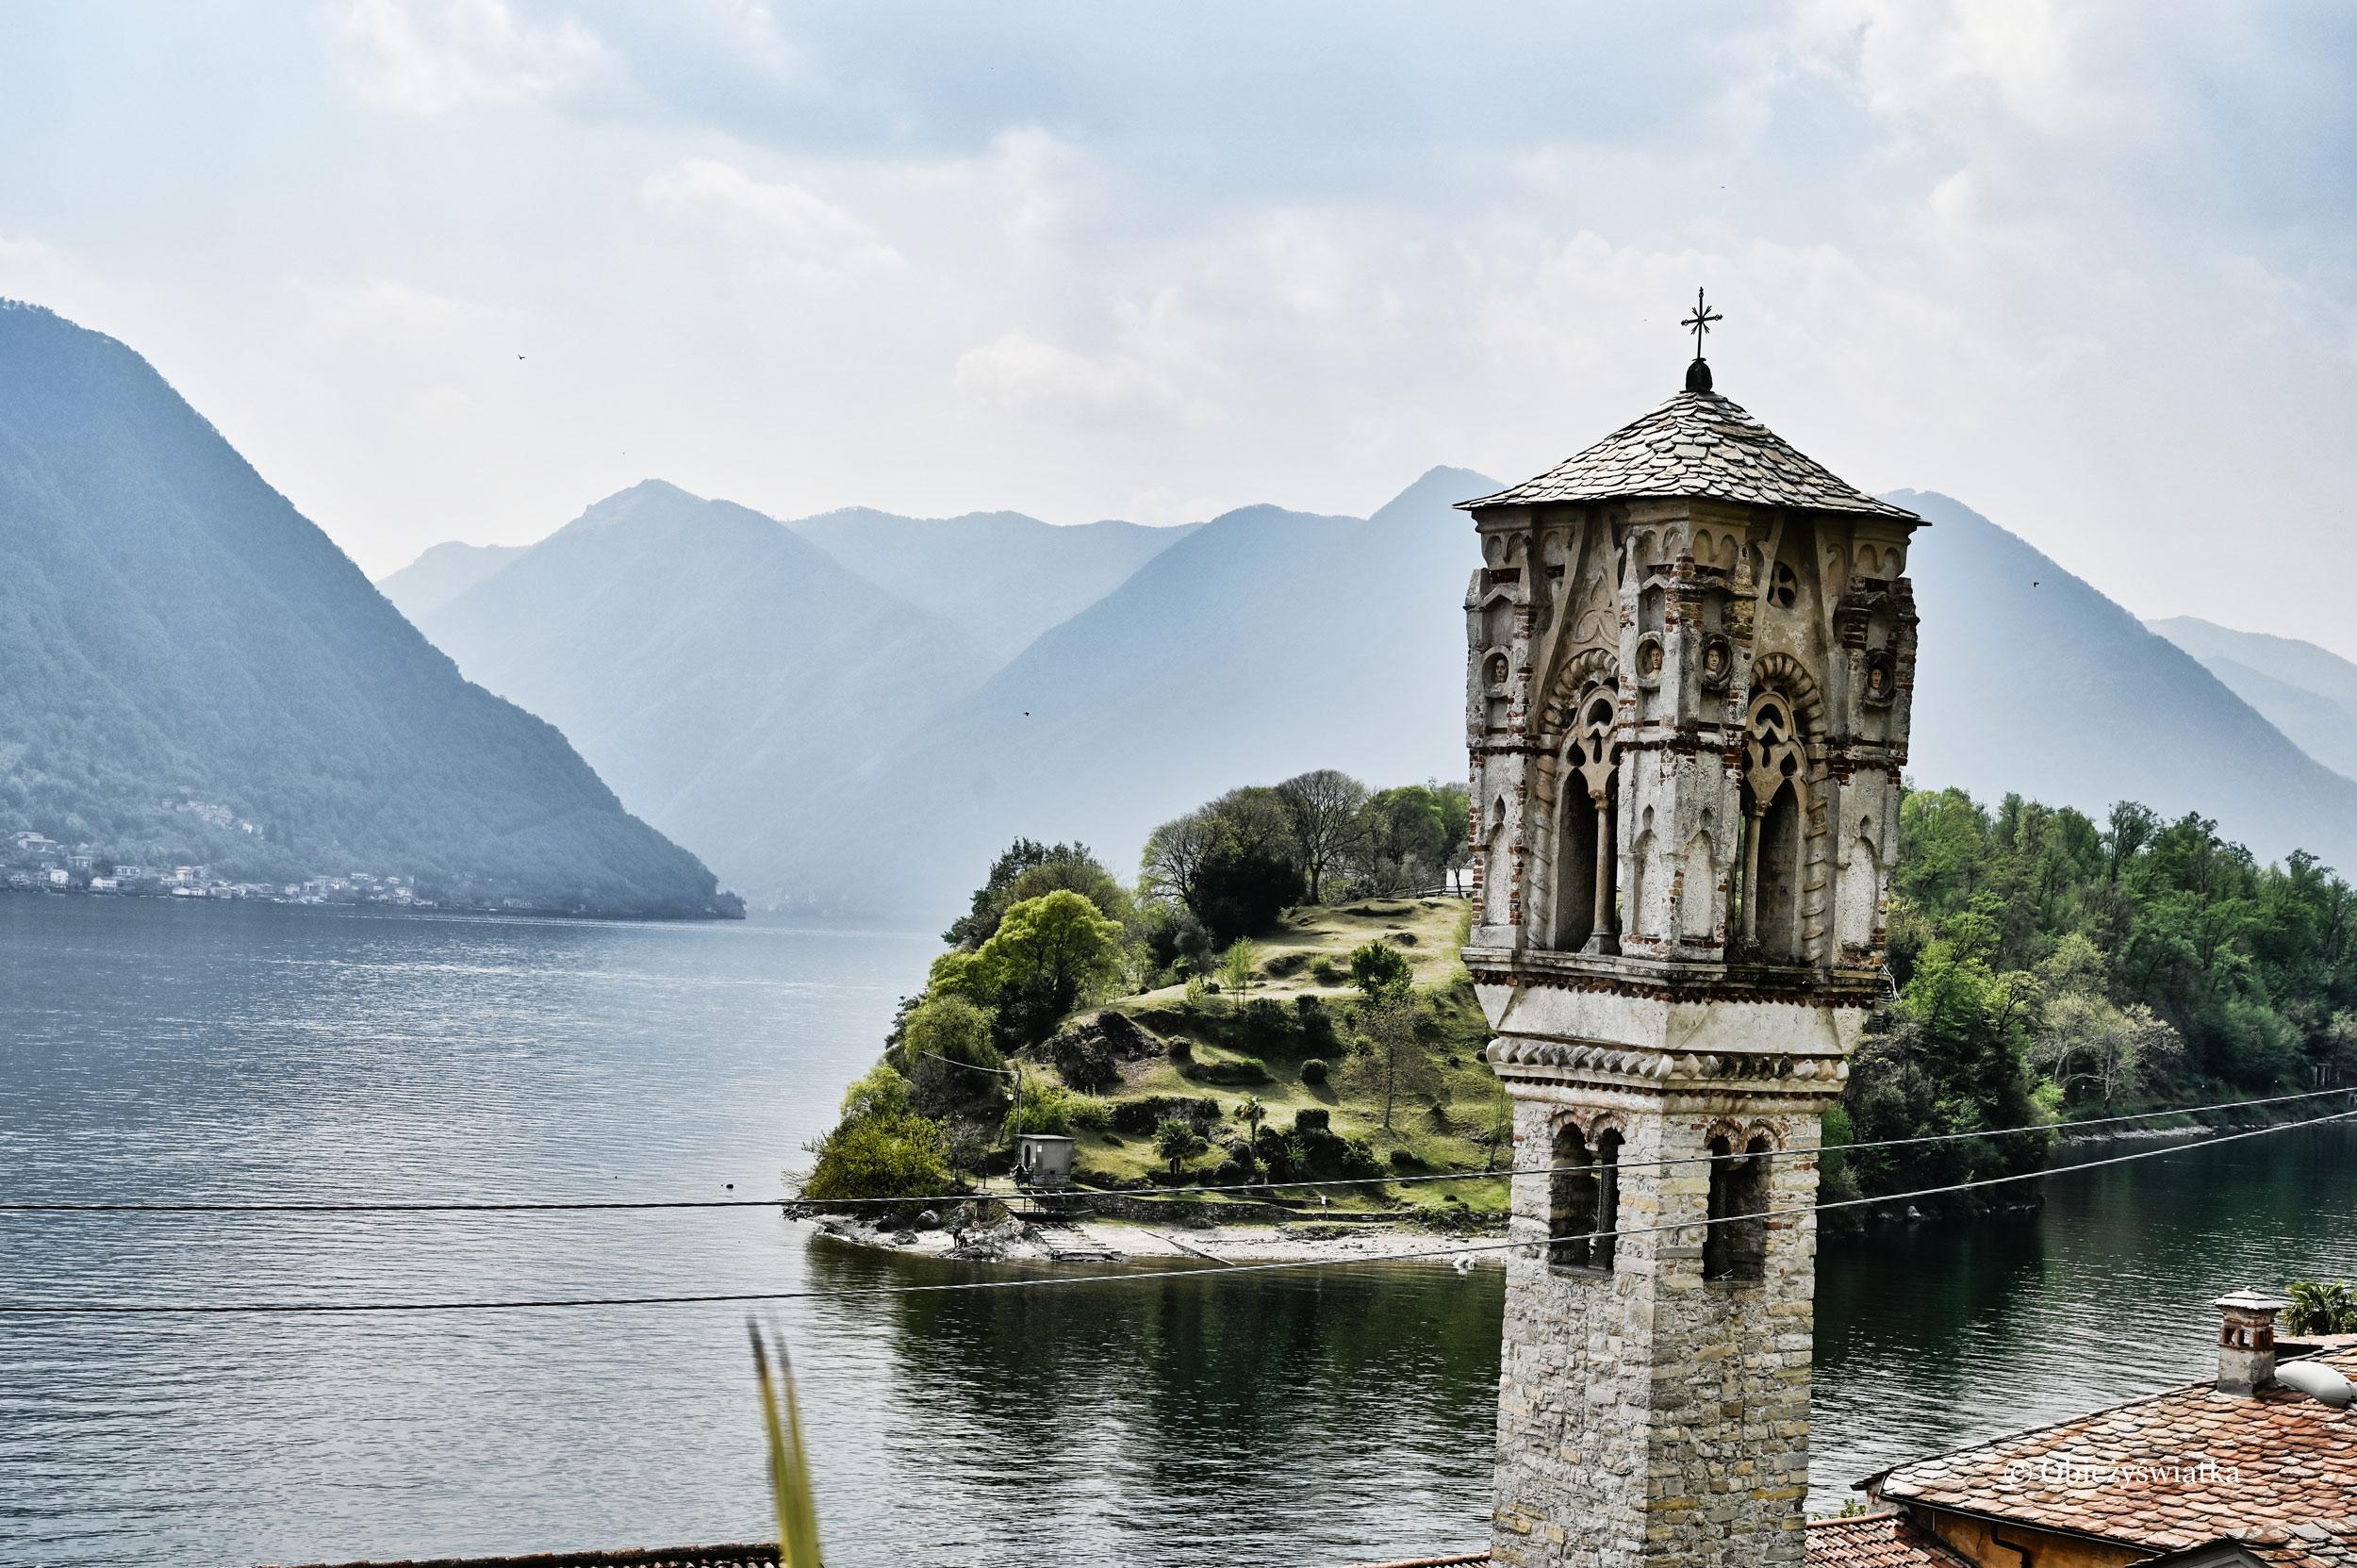 Lago di Como, wieża kościółka Marii Magdaleny i Isola Comacina